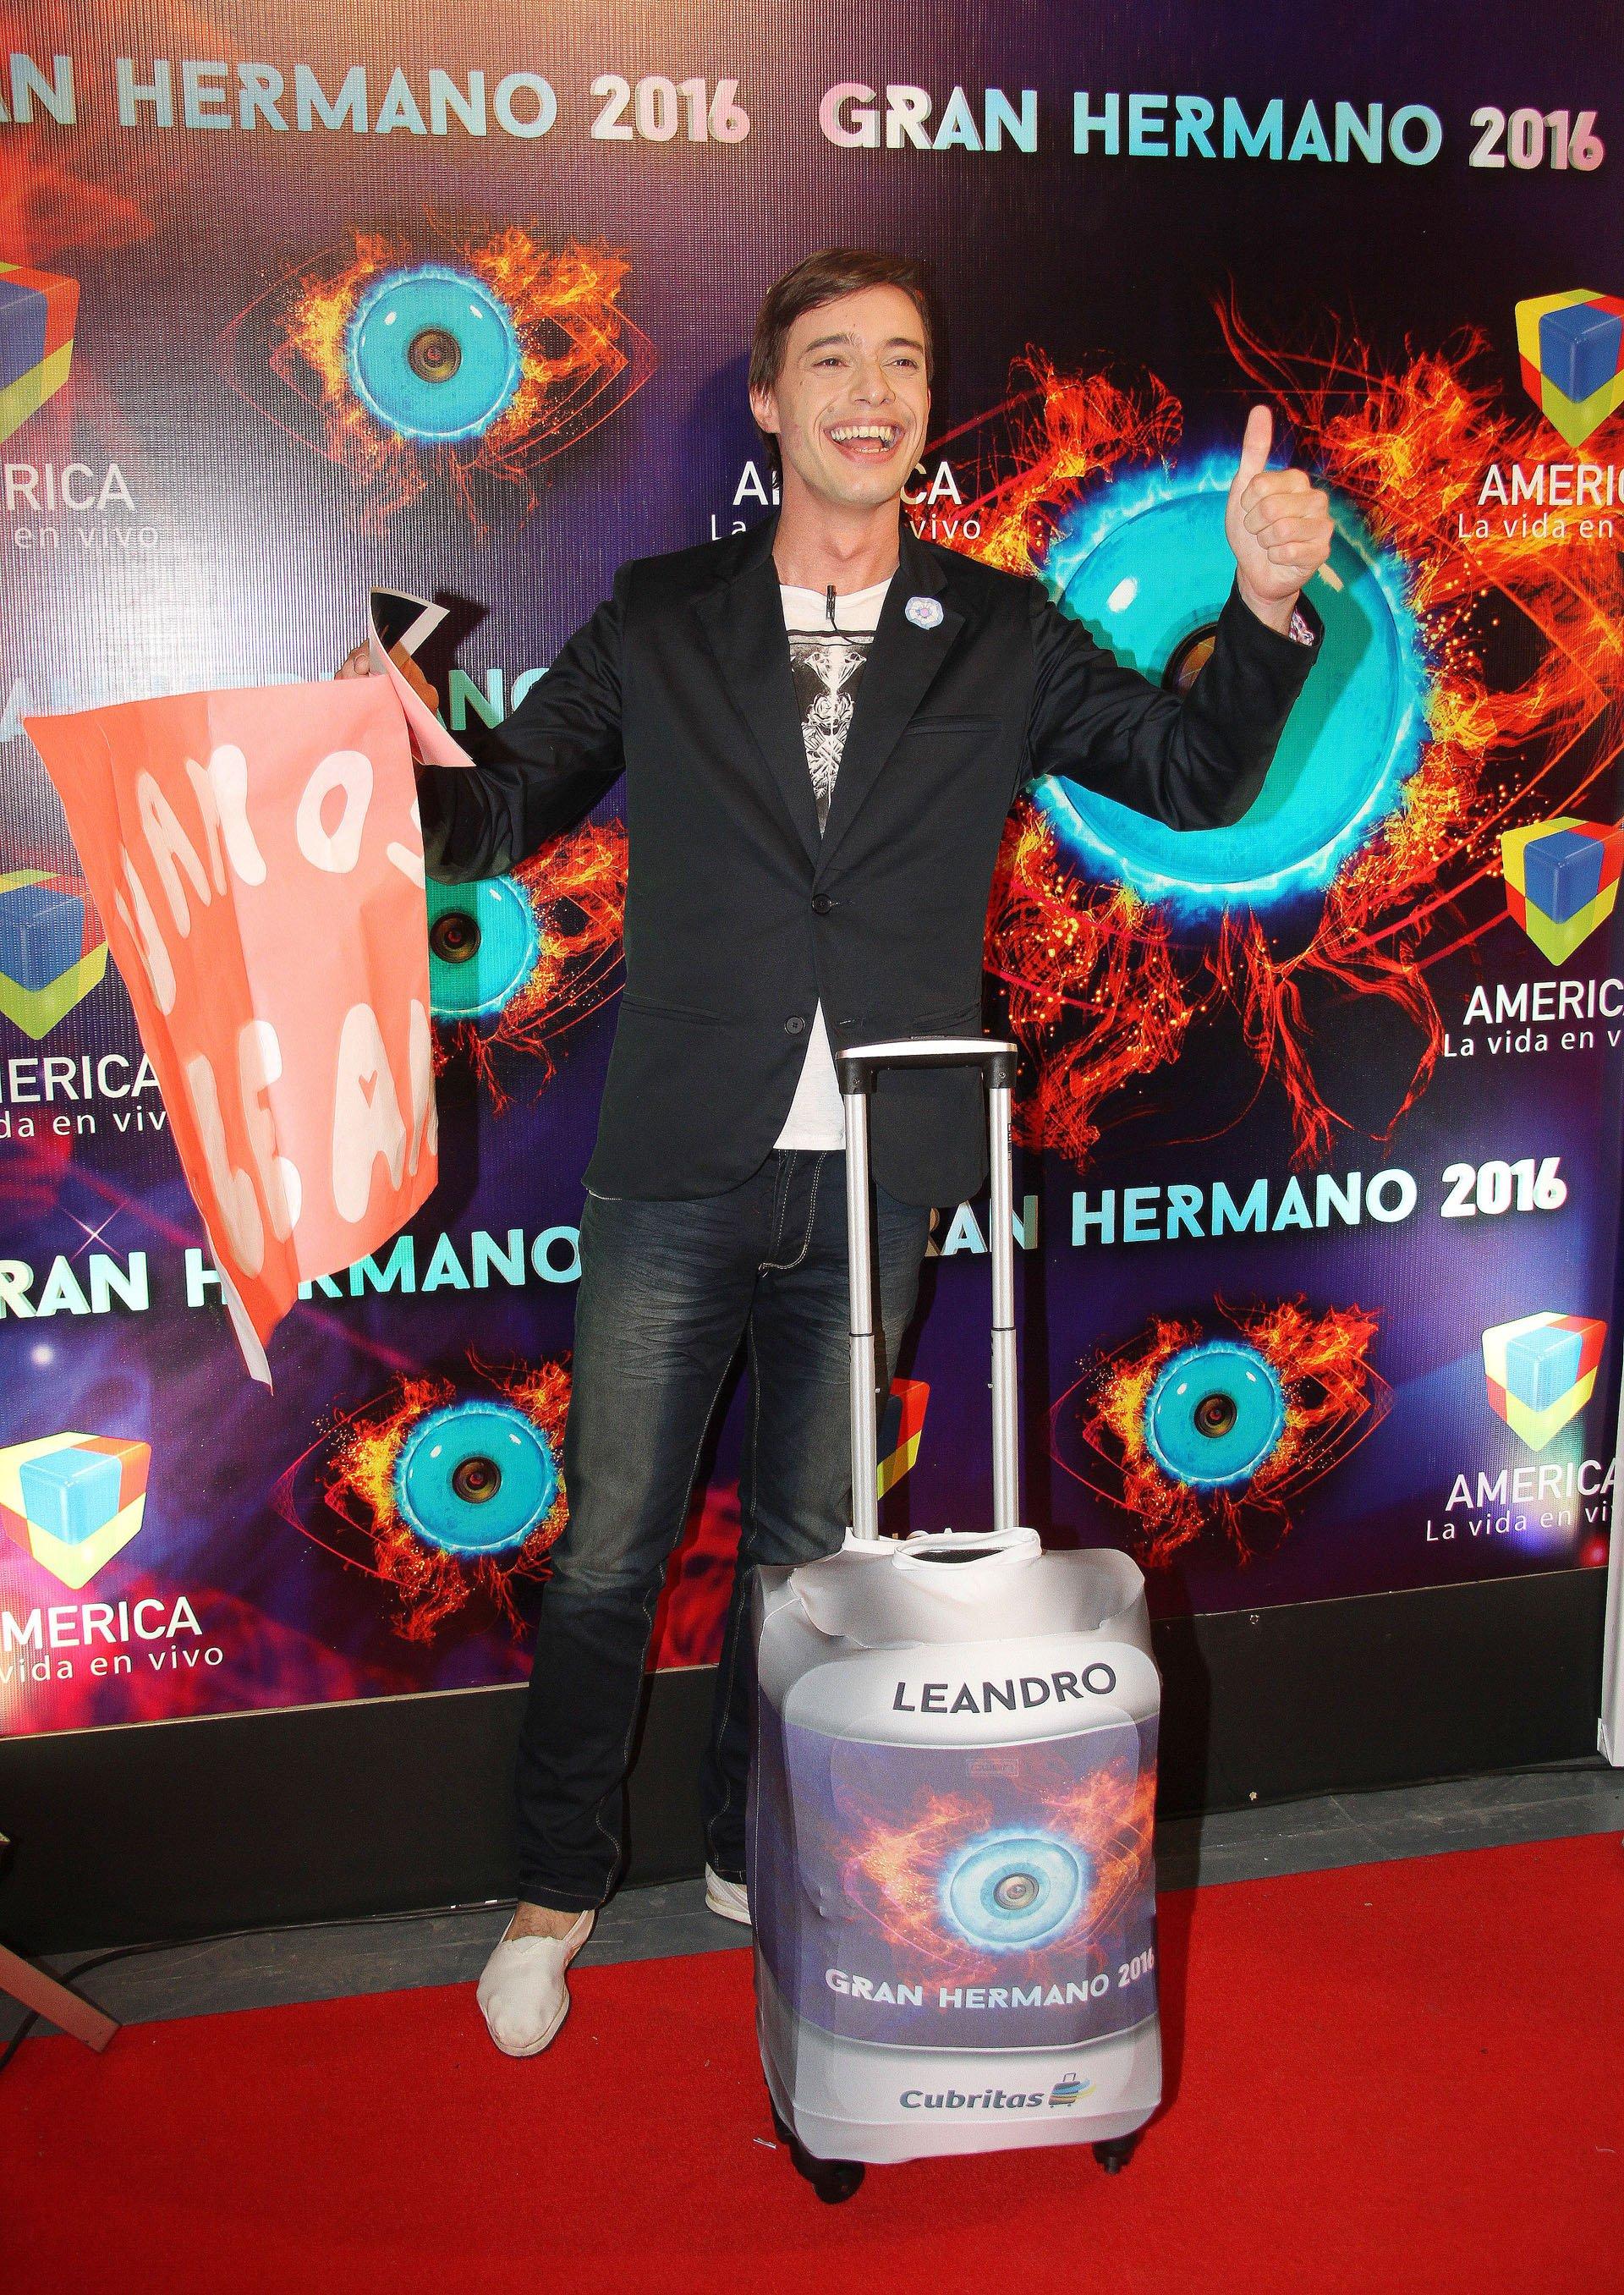 Gran Hermano 2016: Leandro Robin